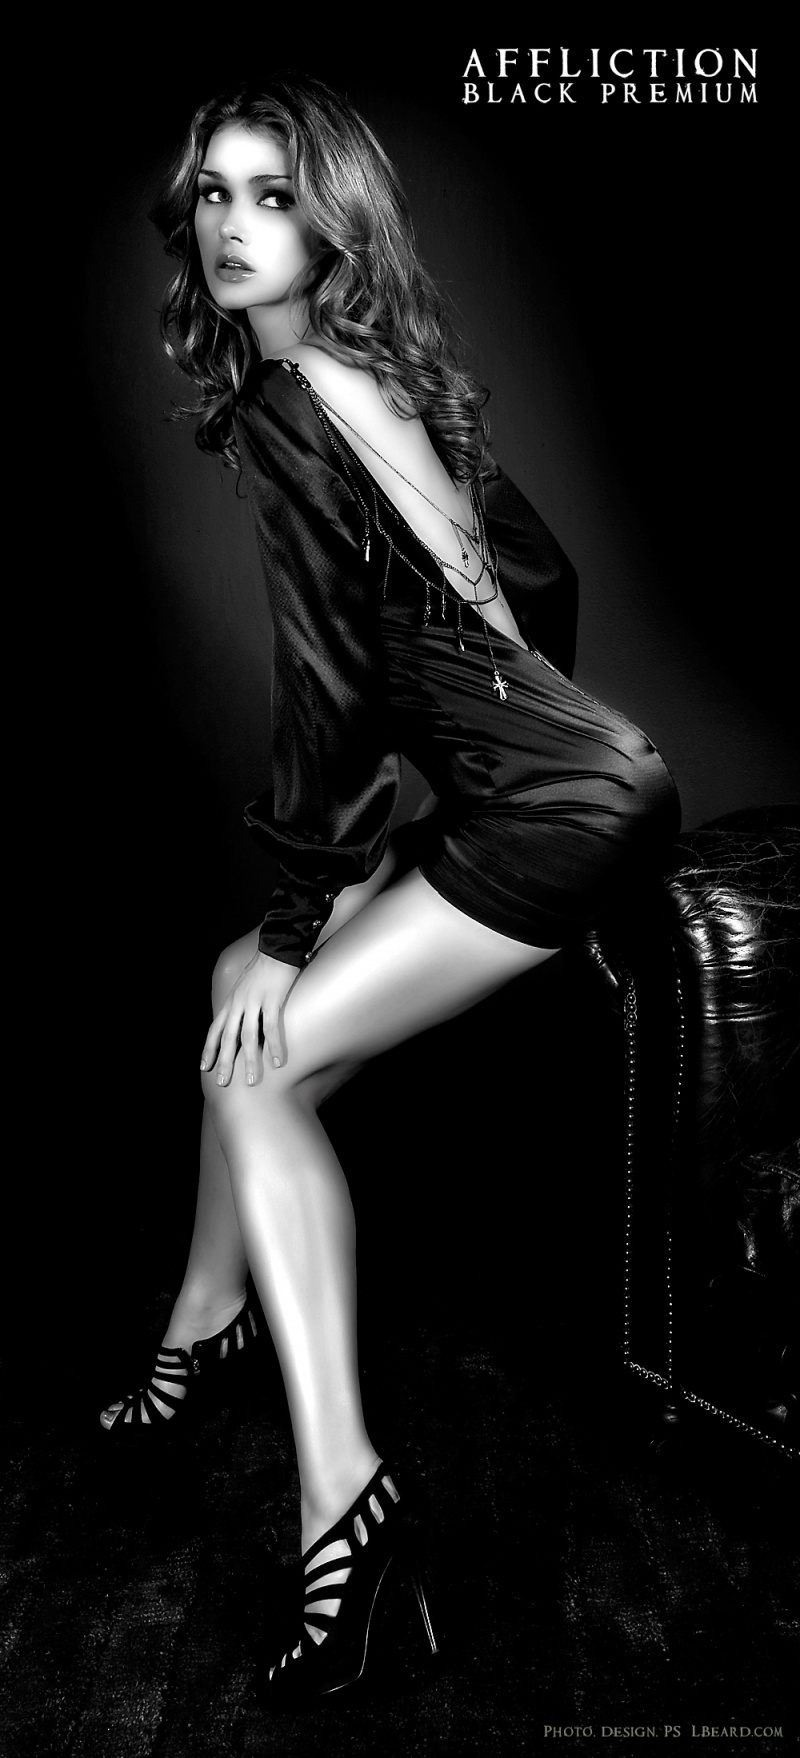 LA CA Jun 08, 2009 LBeard.com Model Sarah Mutch for Affliction Black Premium